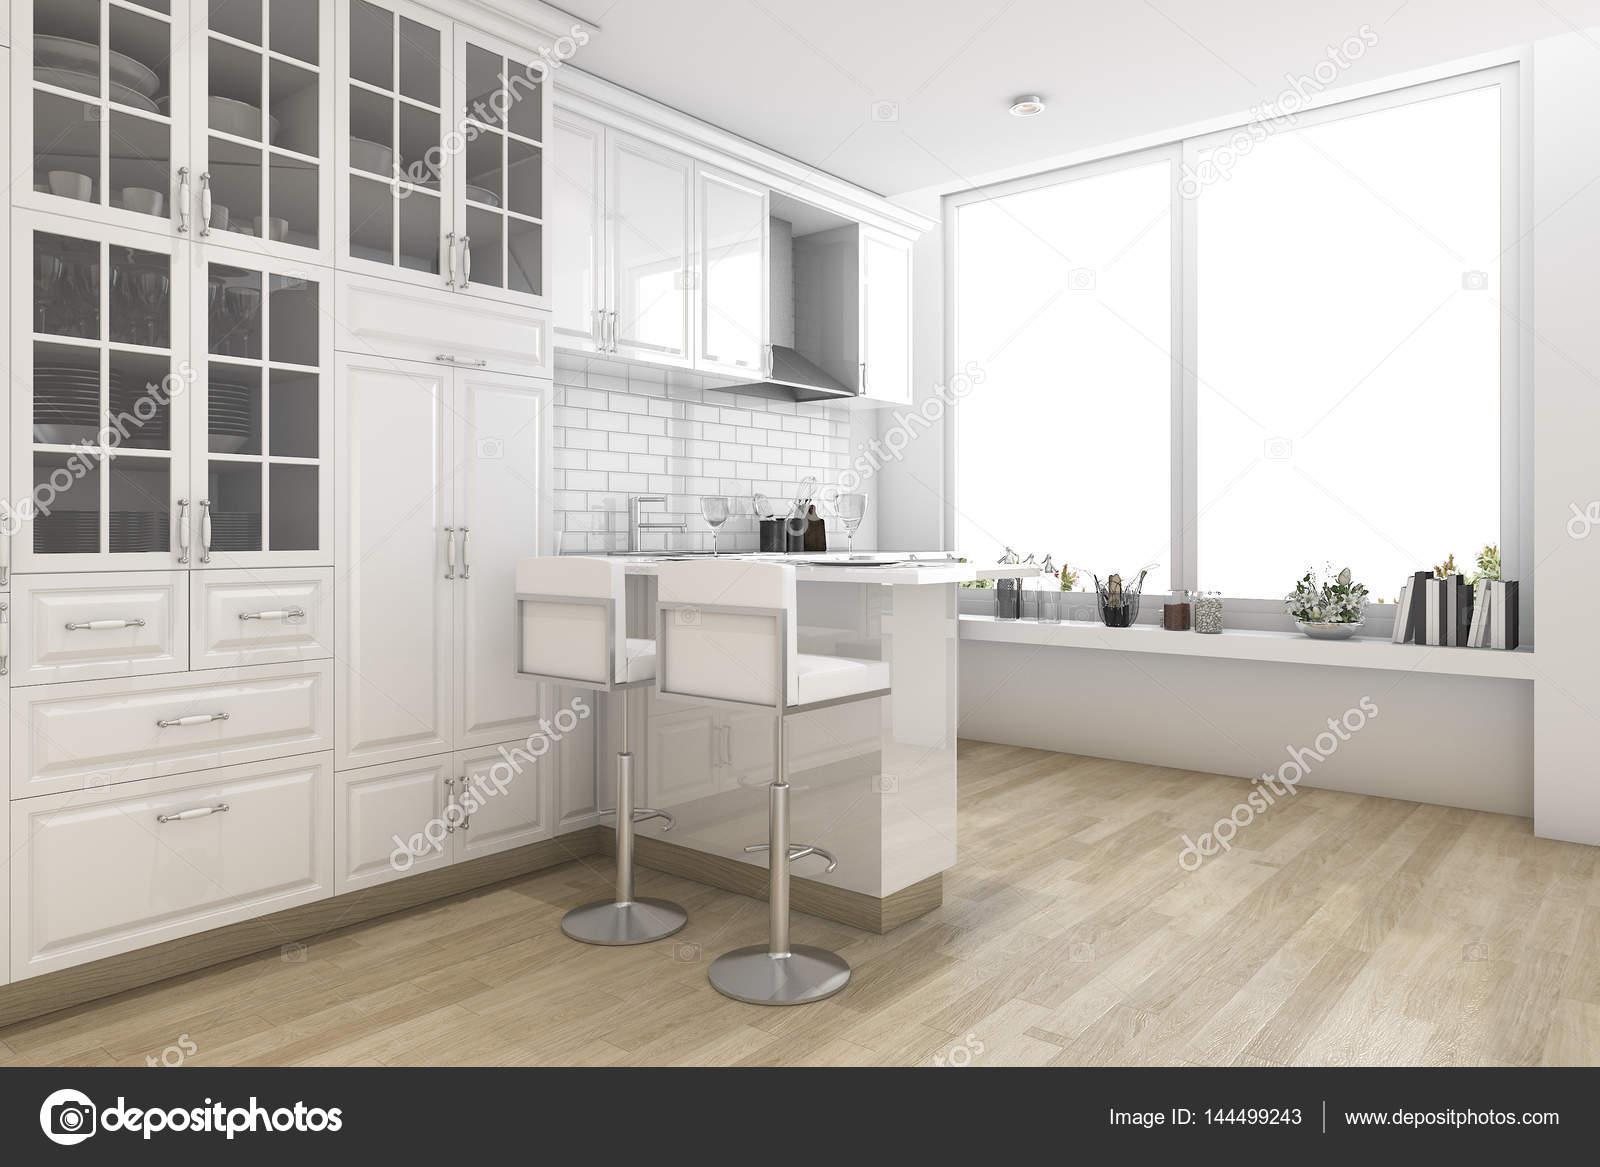 Esszimmer skandinavischer stil  3D Rendering weißen skandinavischen Stil Küche und Esszimmer ...